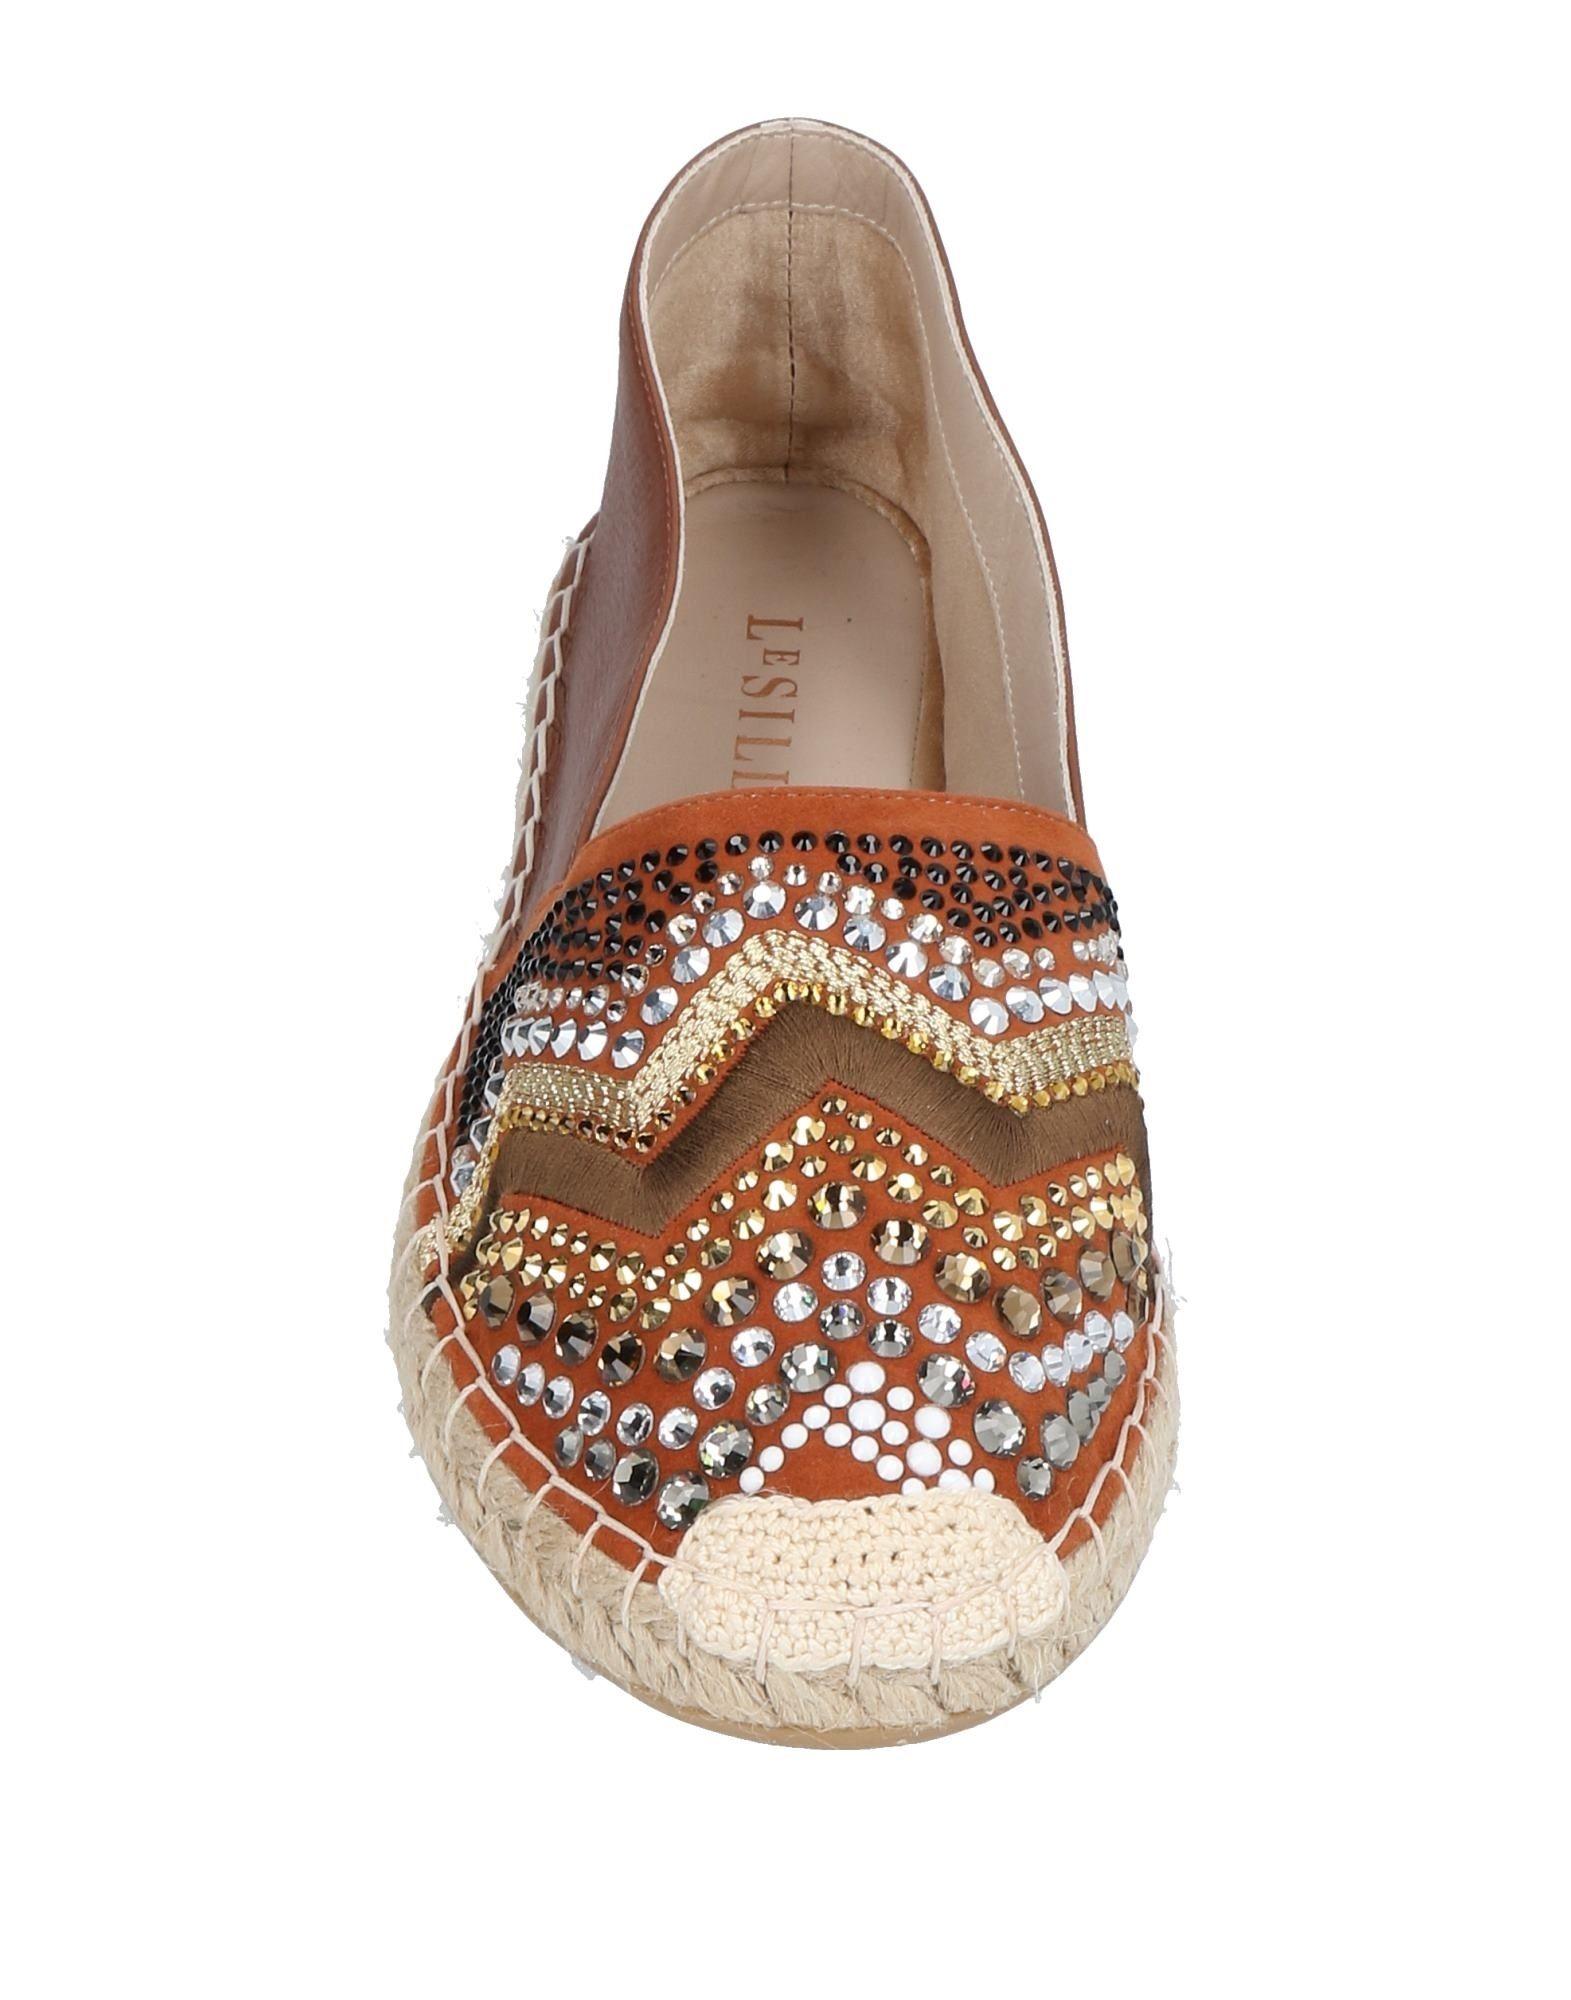 Le 11461553MA Silla Espadrilles Damen  11461553MA Le Beliebte Schuhe f08fef